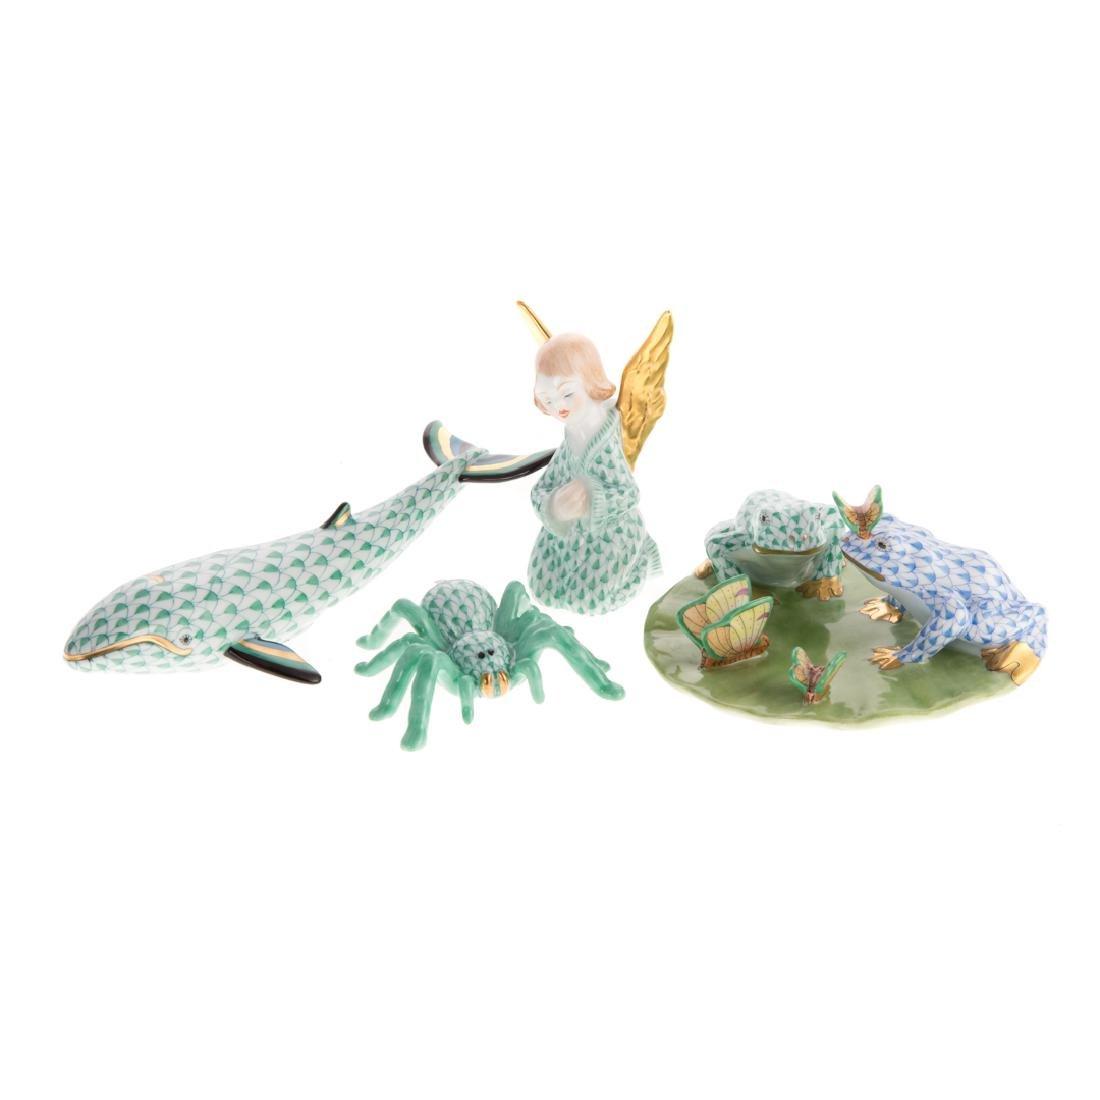 Four Herend porcelain figures